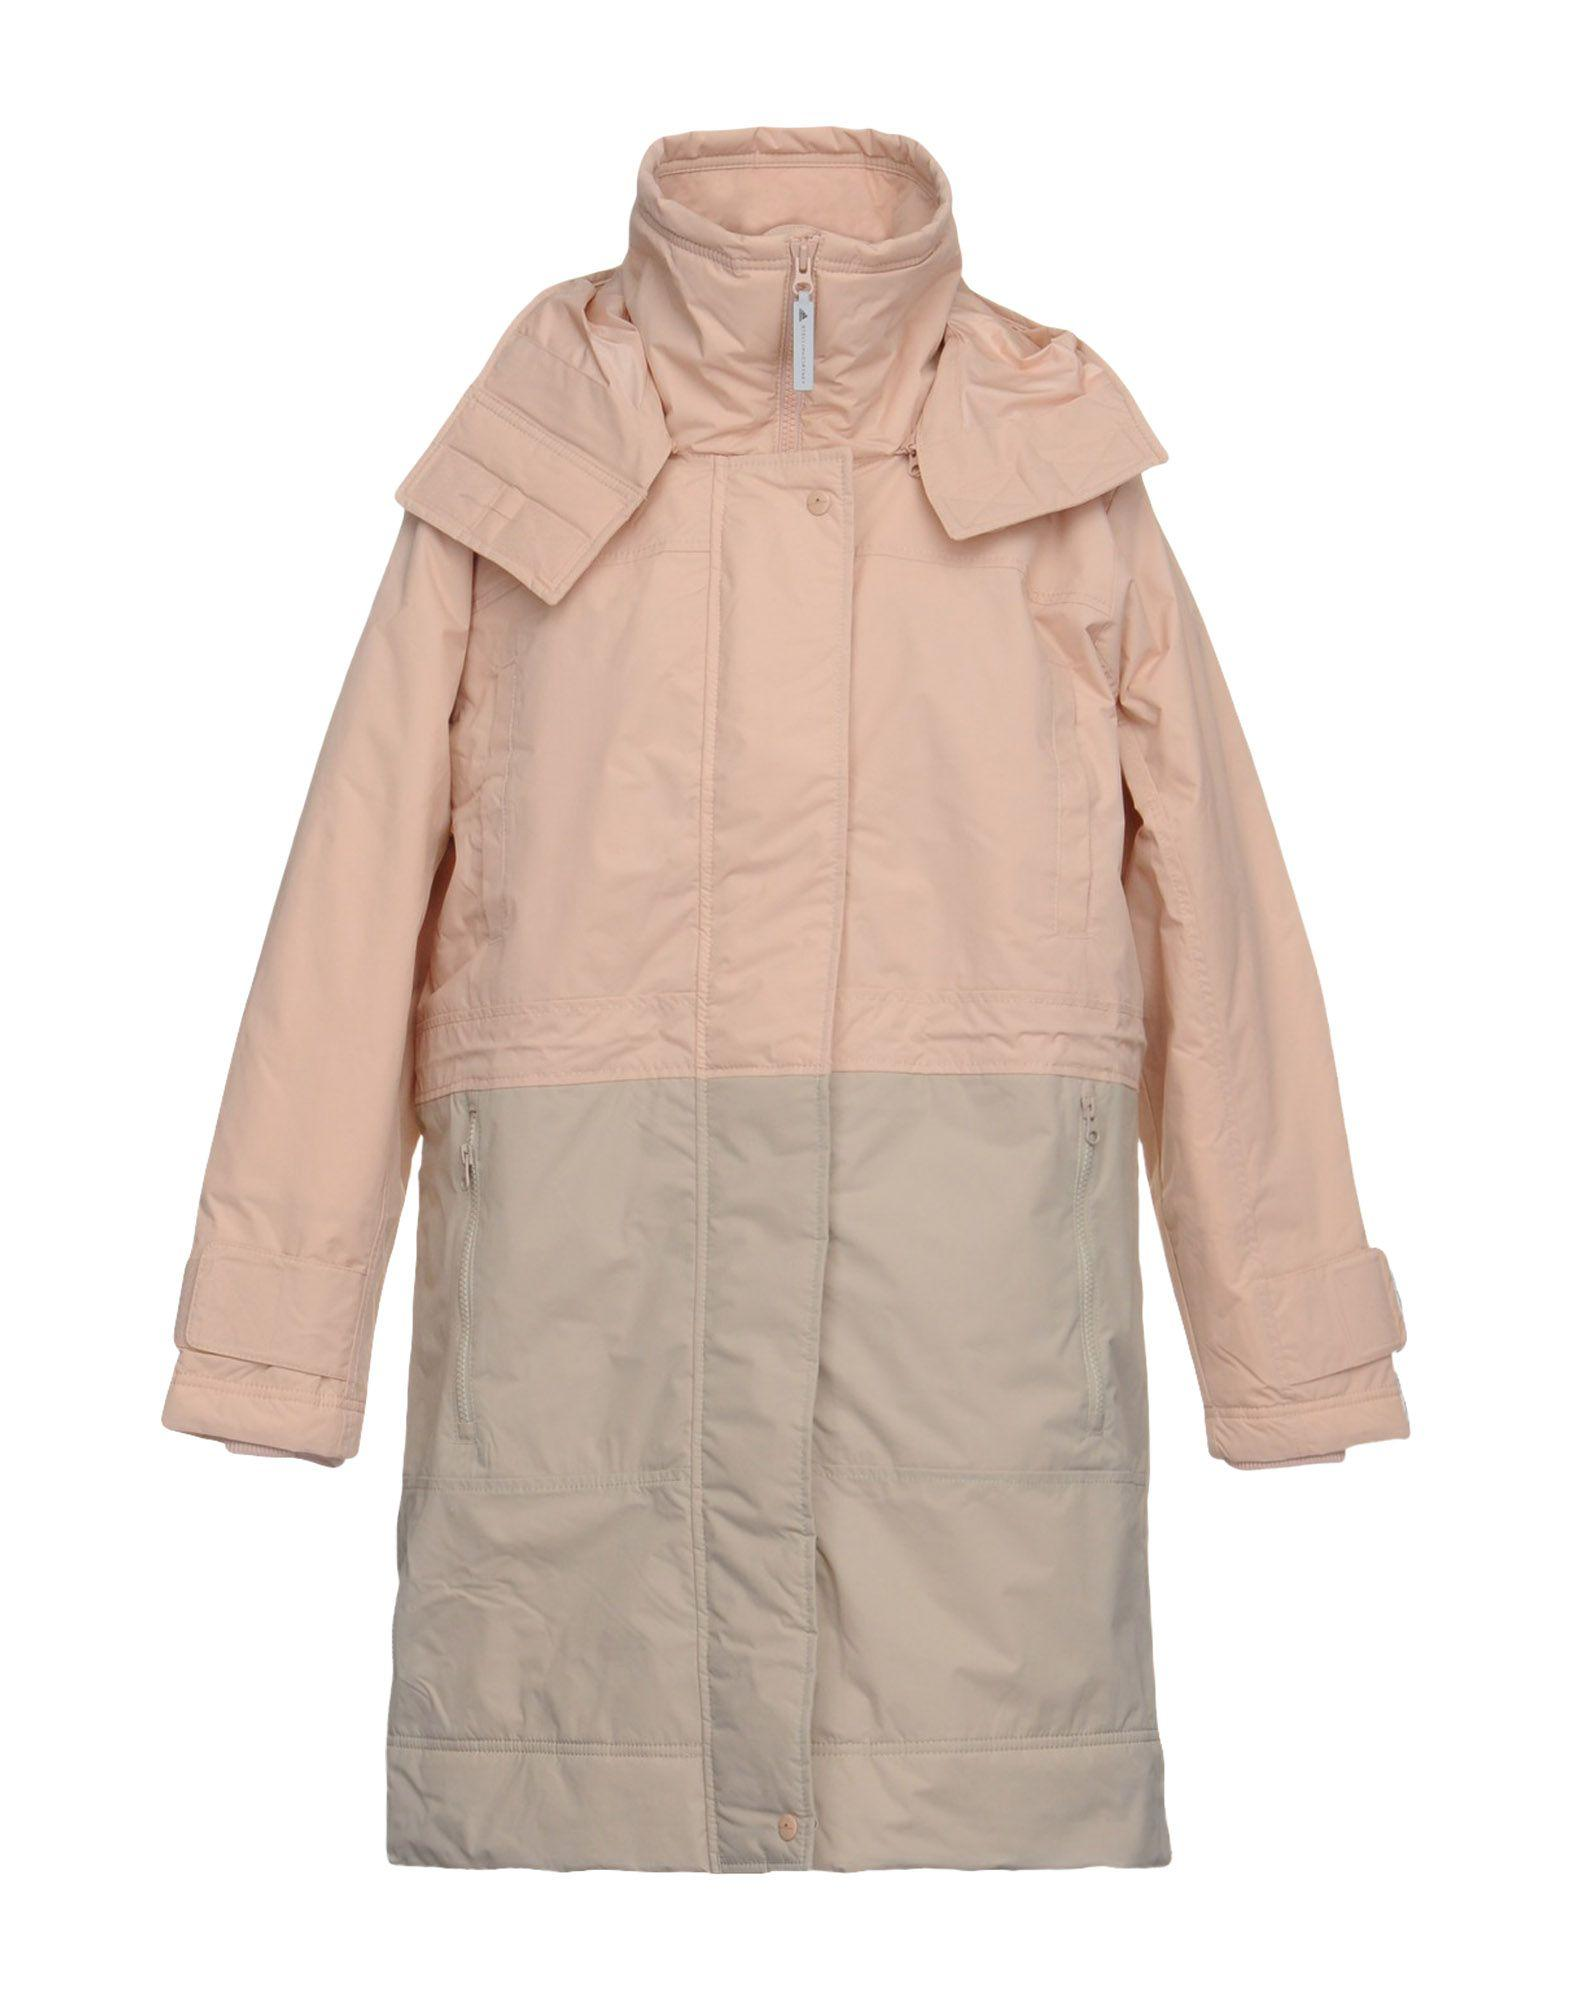 Adidas By Stella Mccartney Jacket In Pink